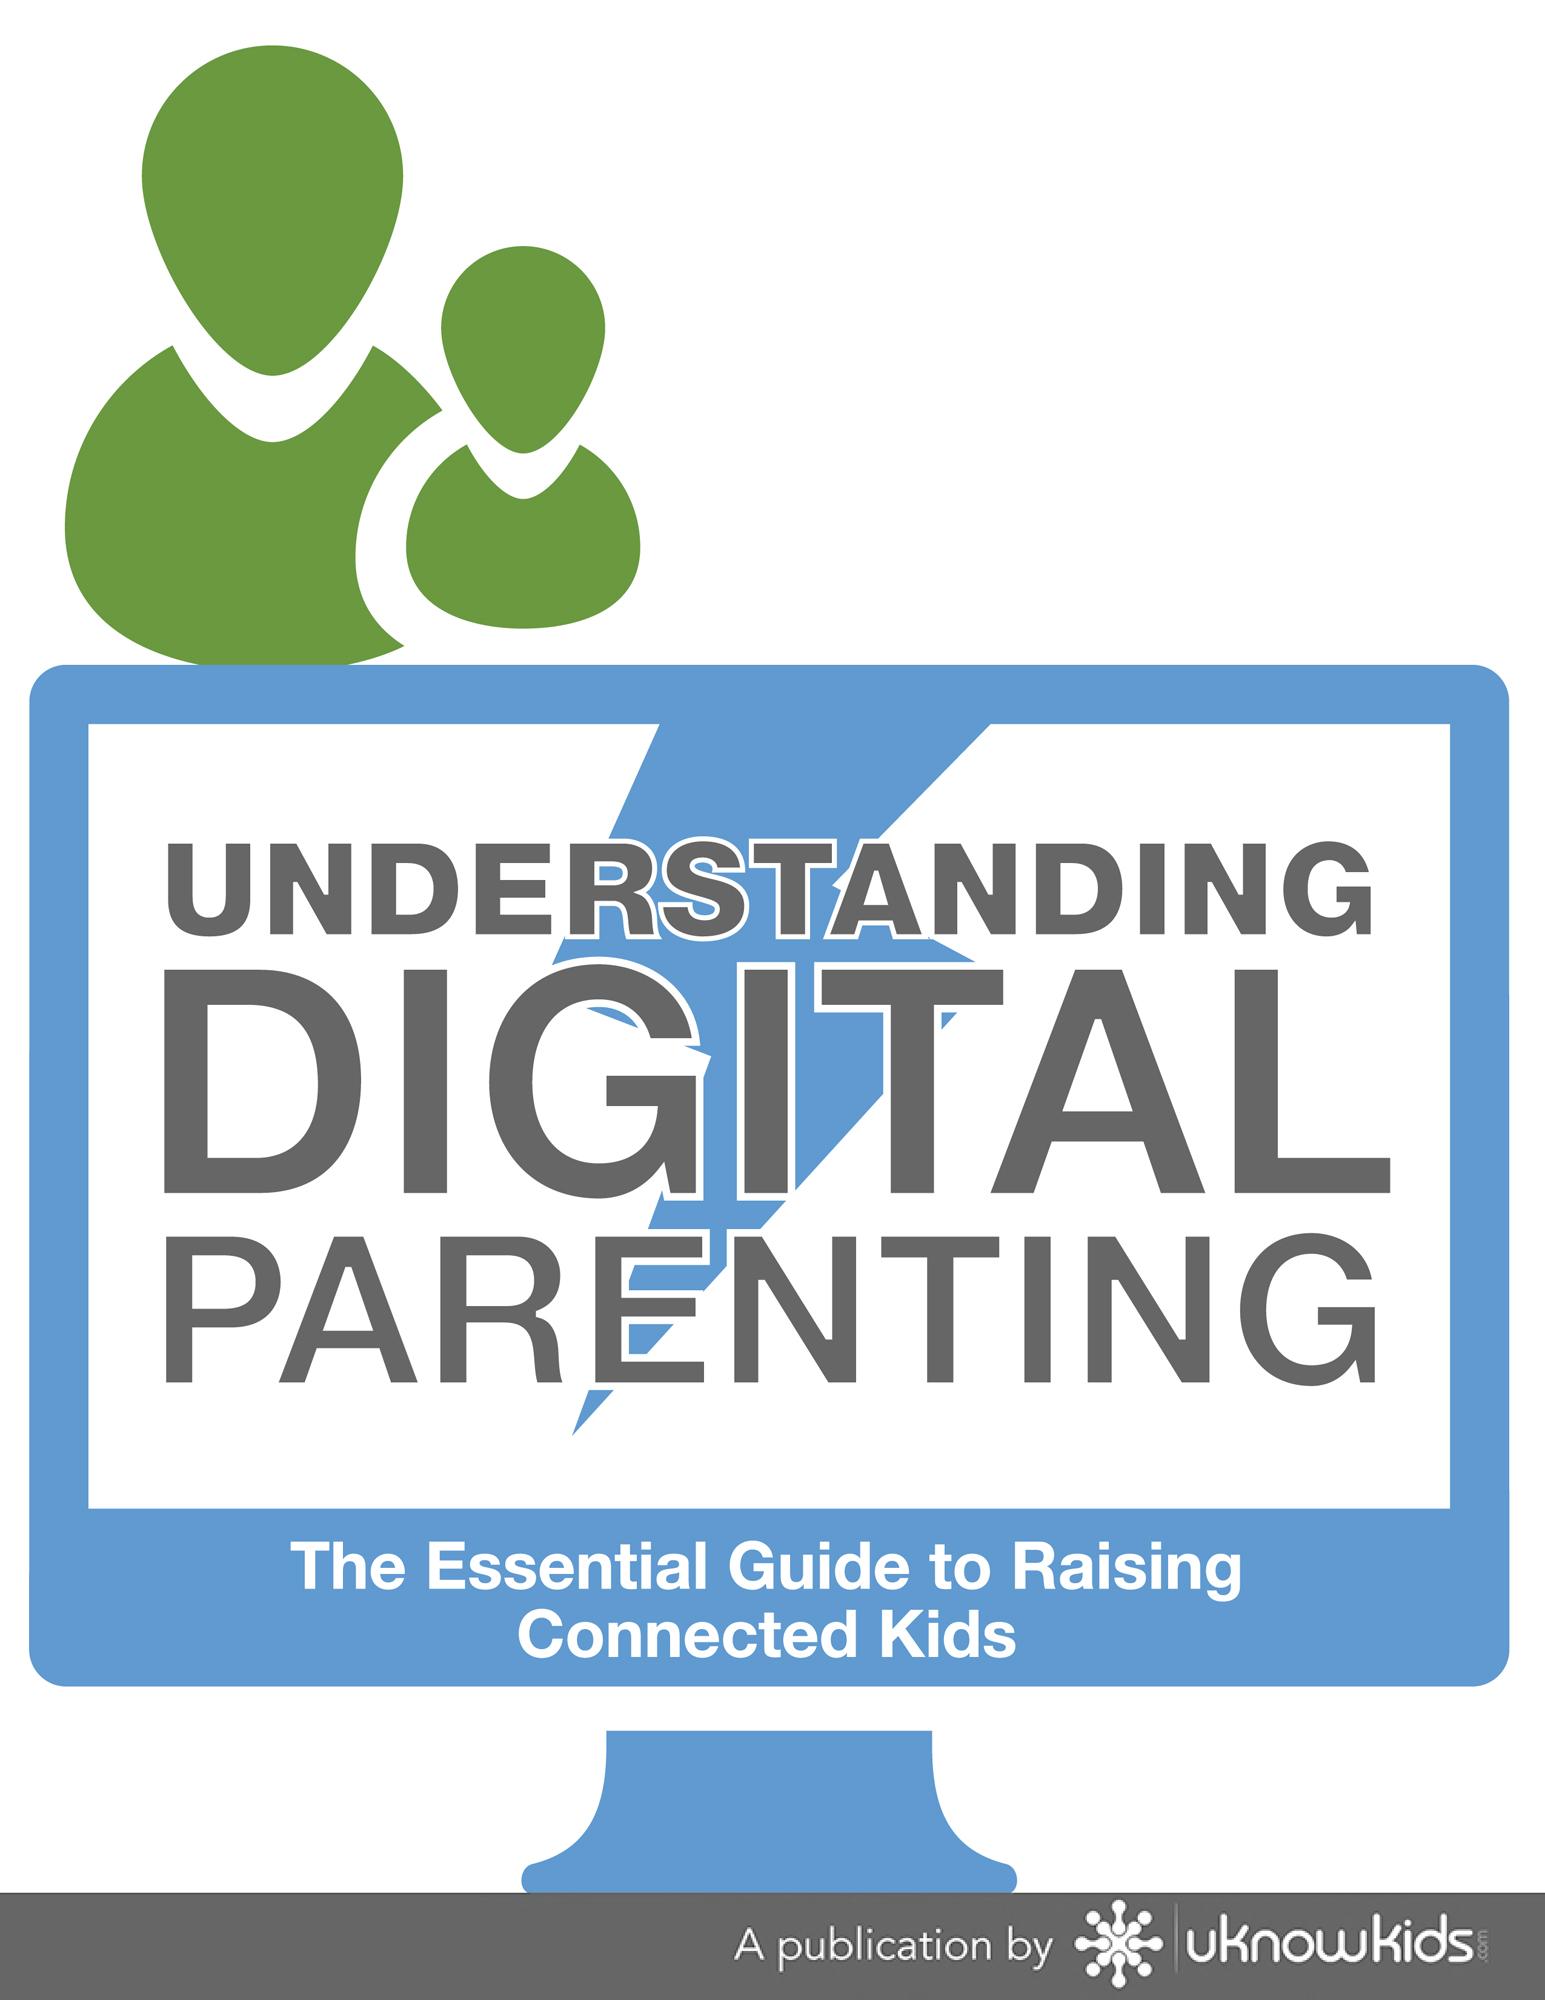 Digital Parenting: Achieving a thorough understanding